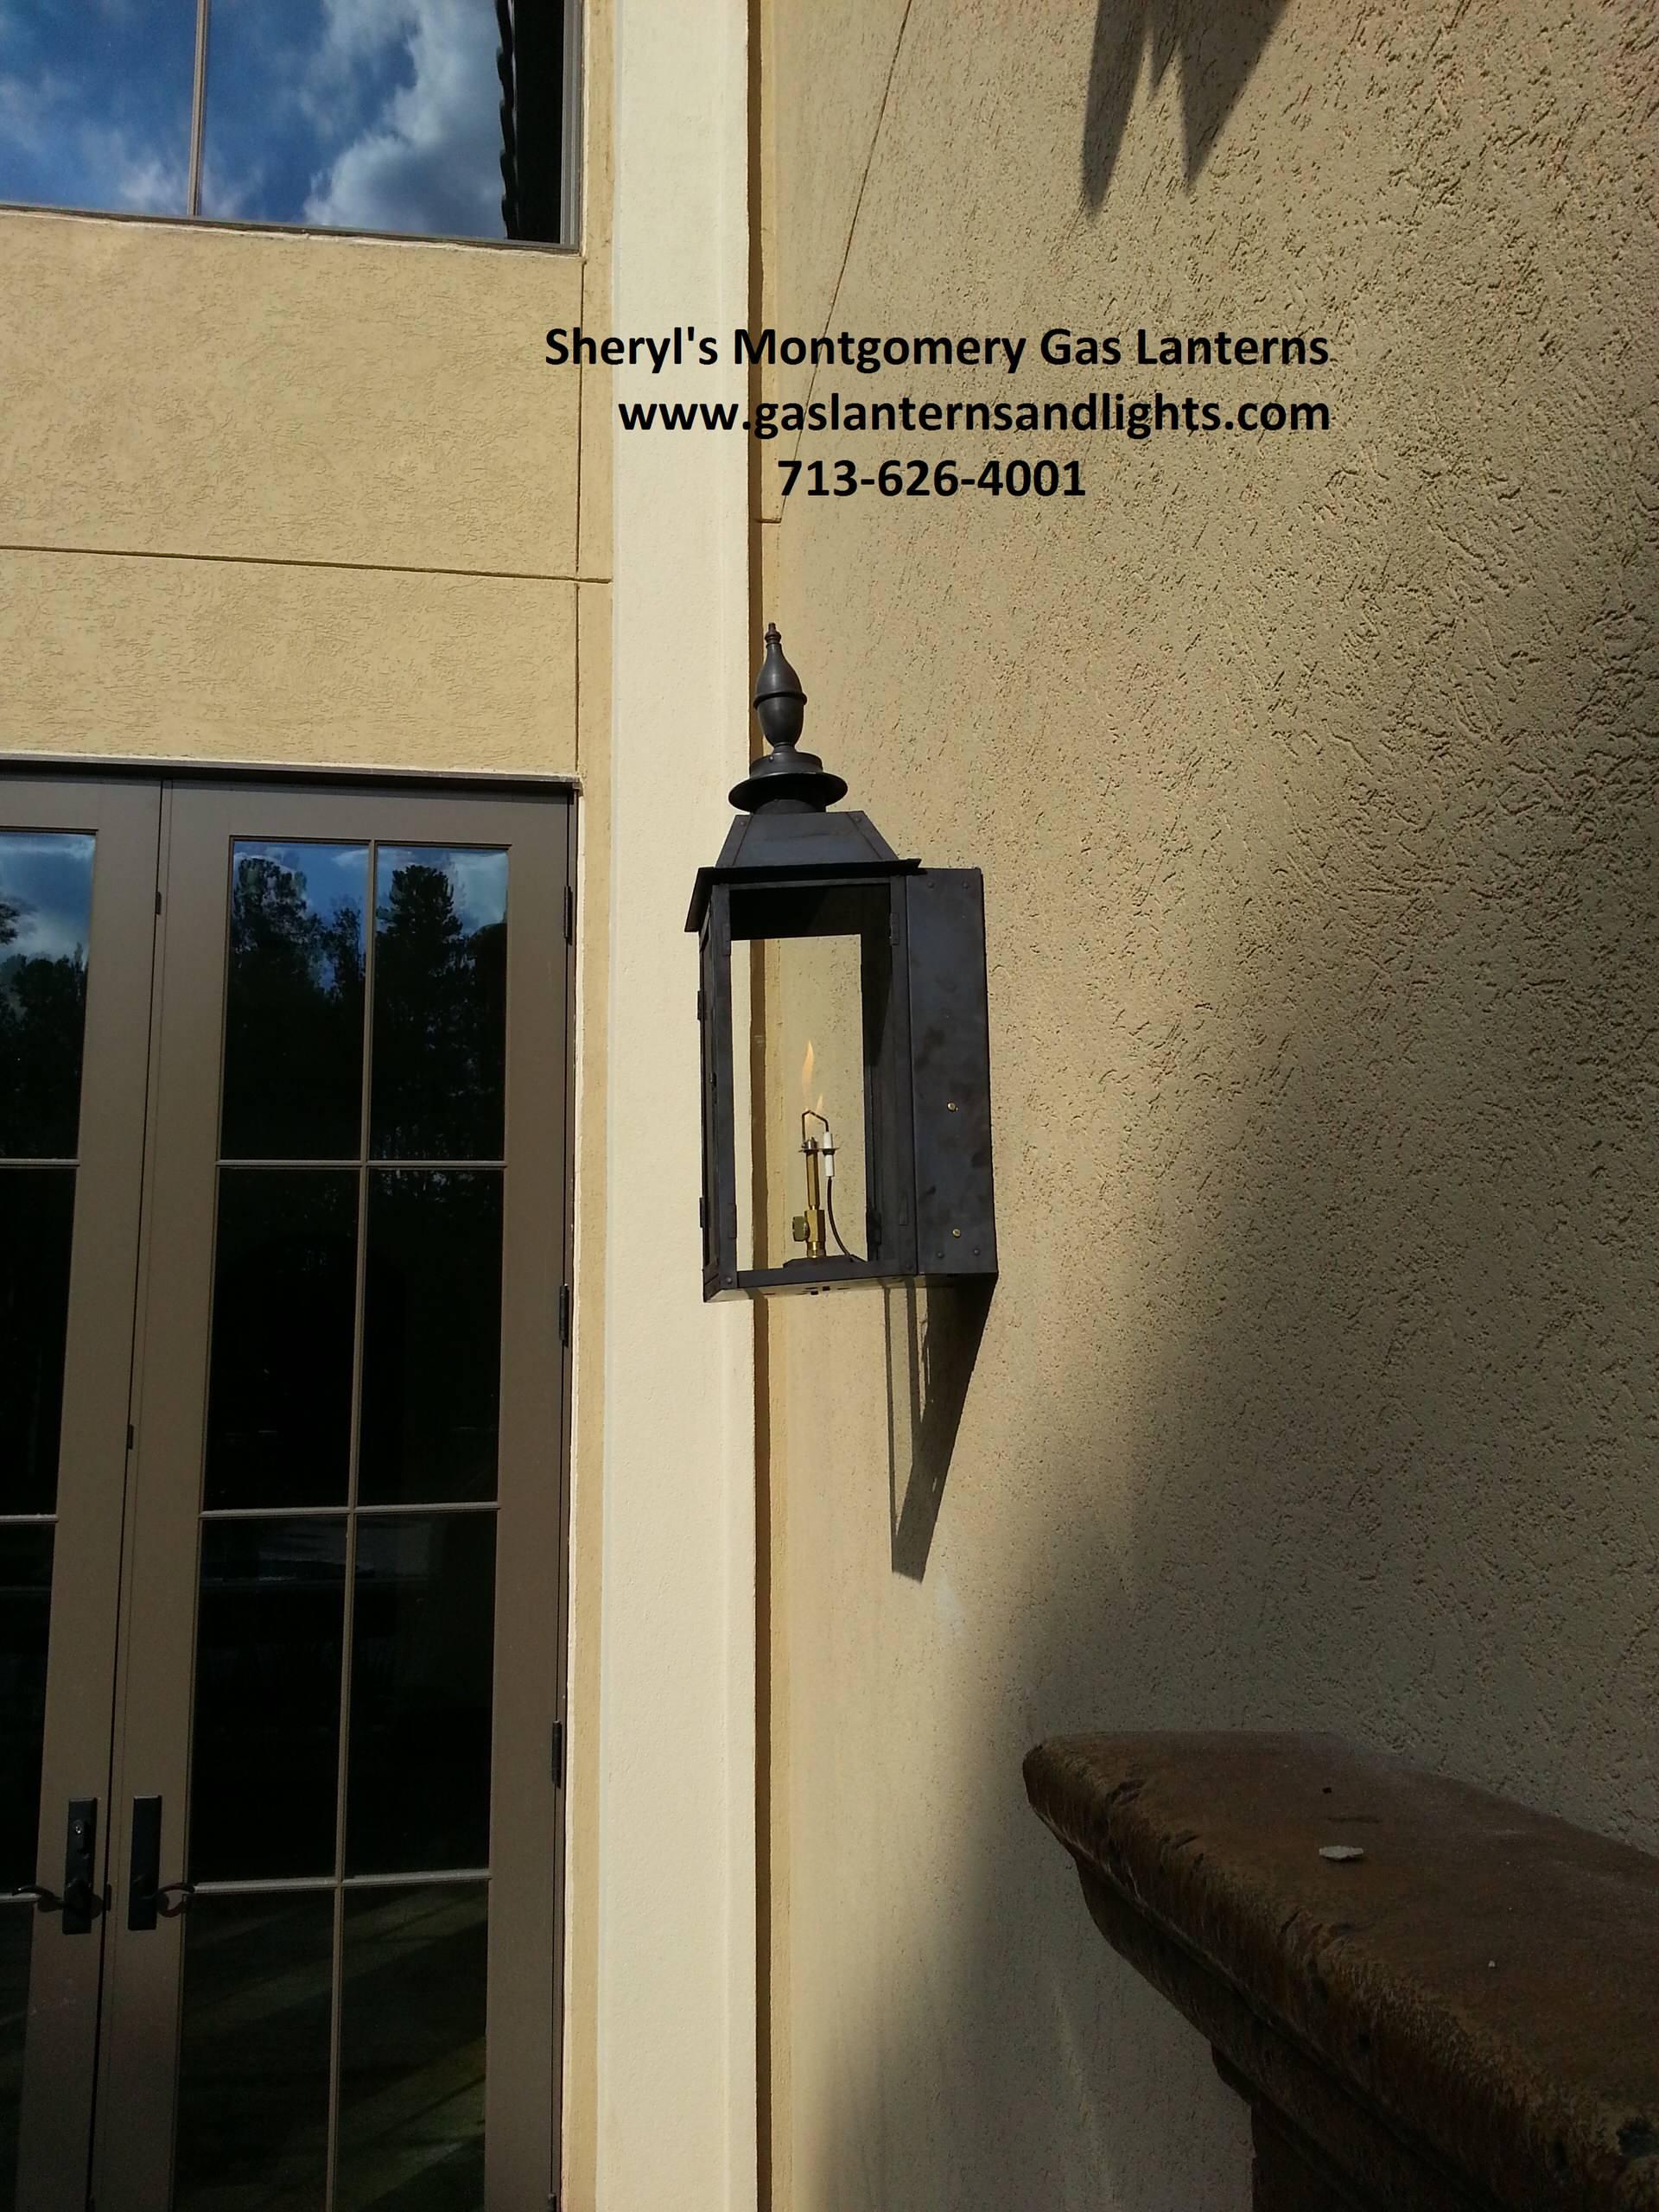 Sheryl's Montgomery Gas Lanterns